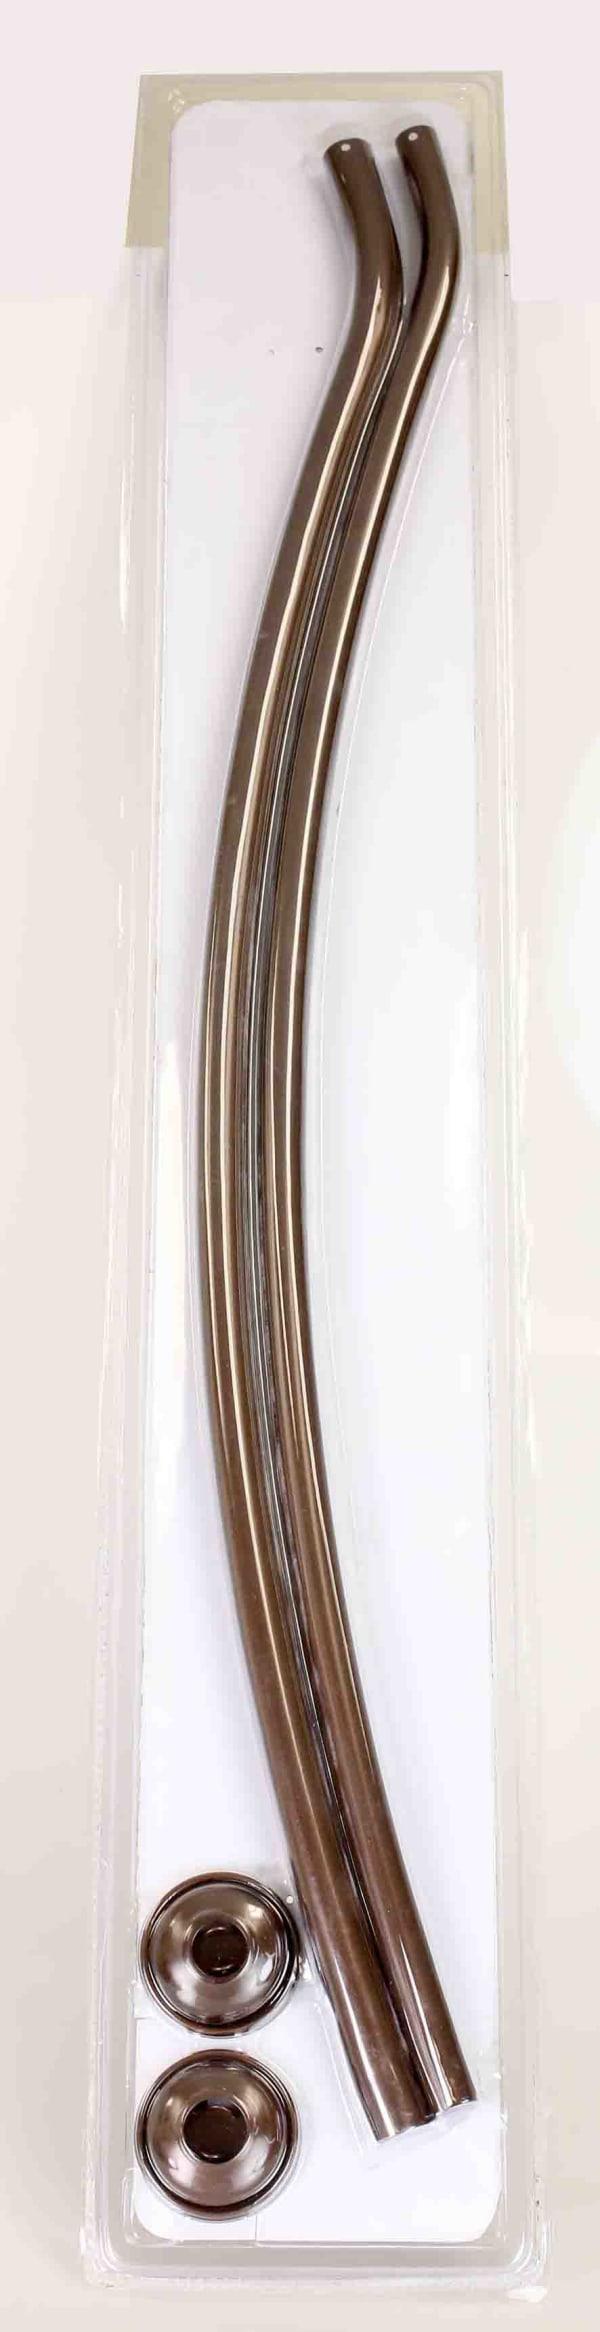 Bronze Steel Curved Shower Rod